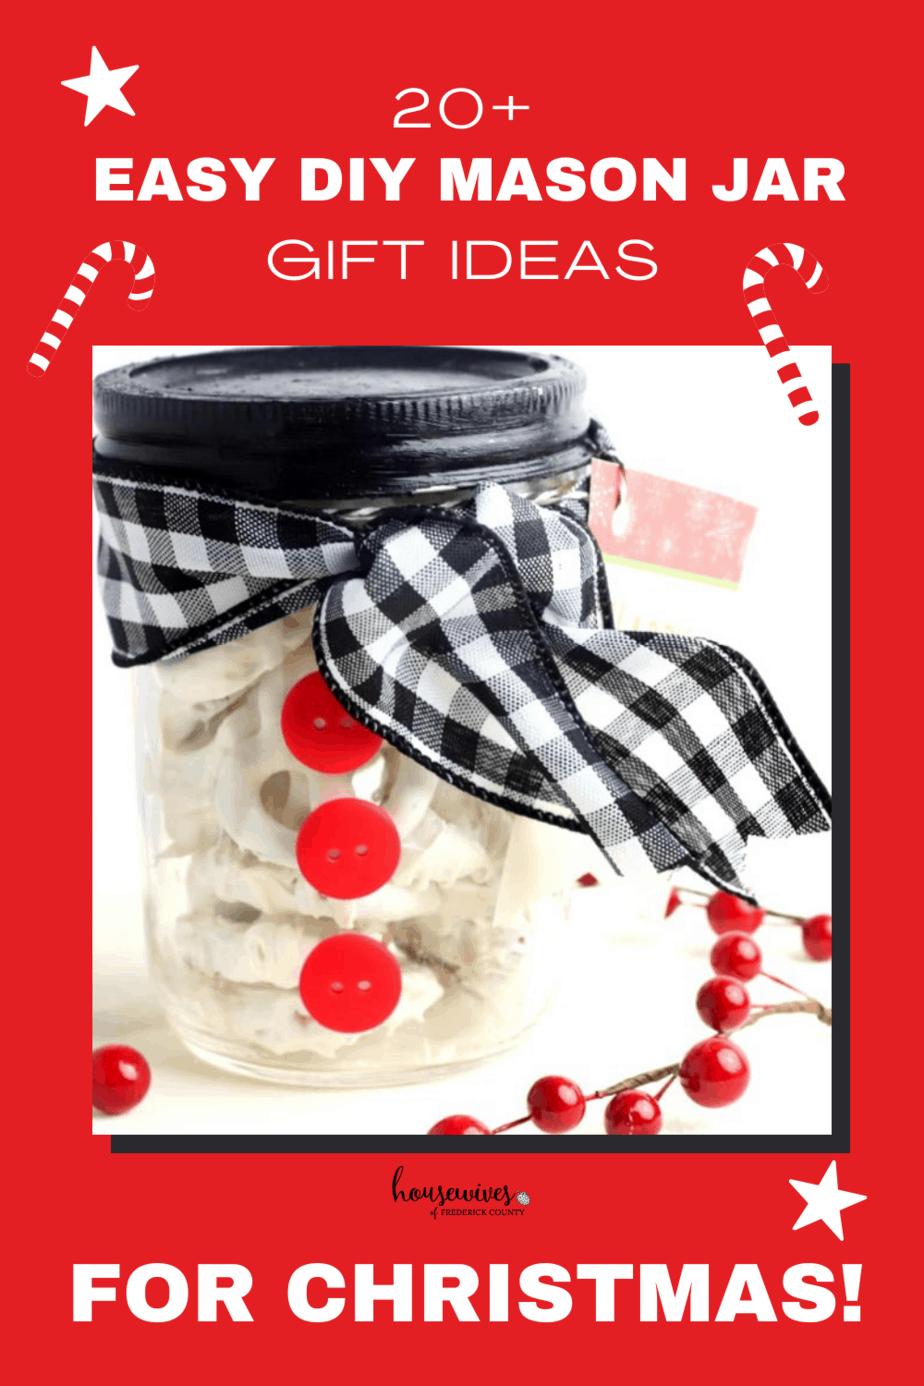 20+ Easy DIY Mason Jar Gift Ideas for Christmas